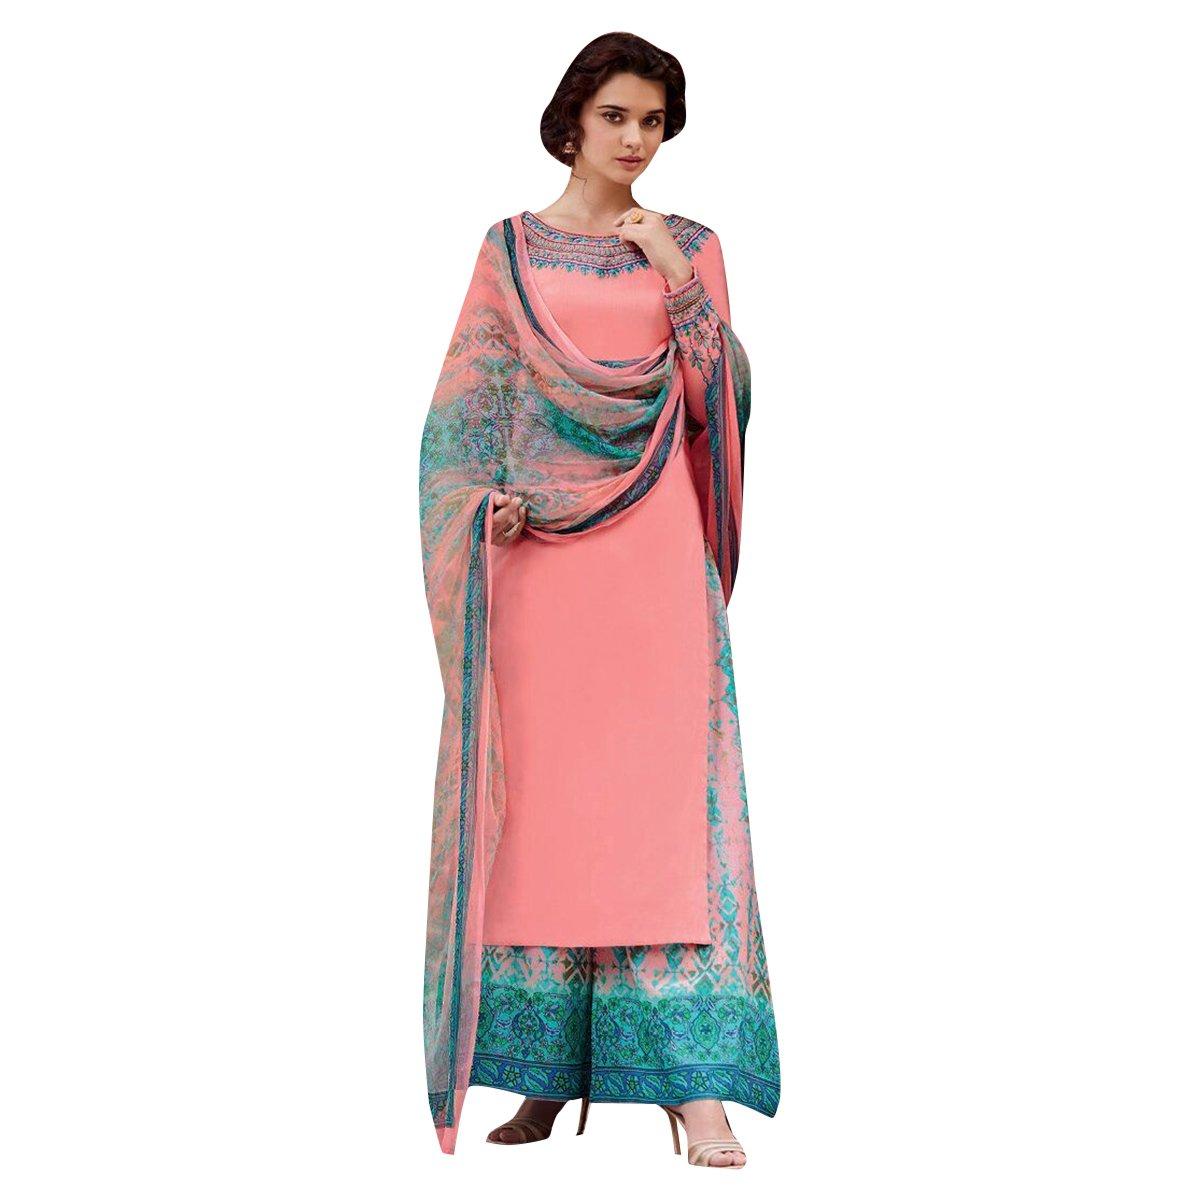 Vestido Fiesta Desgaste étnica plazo Traje Straight Salwar ...